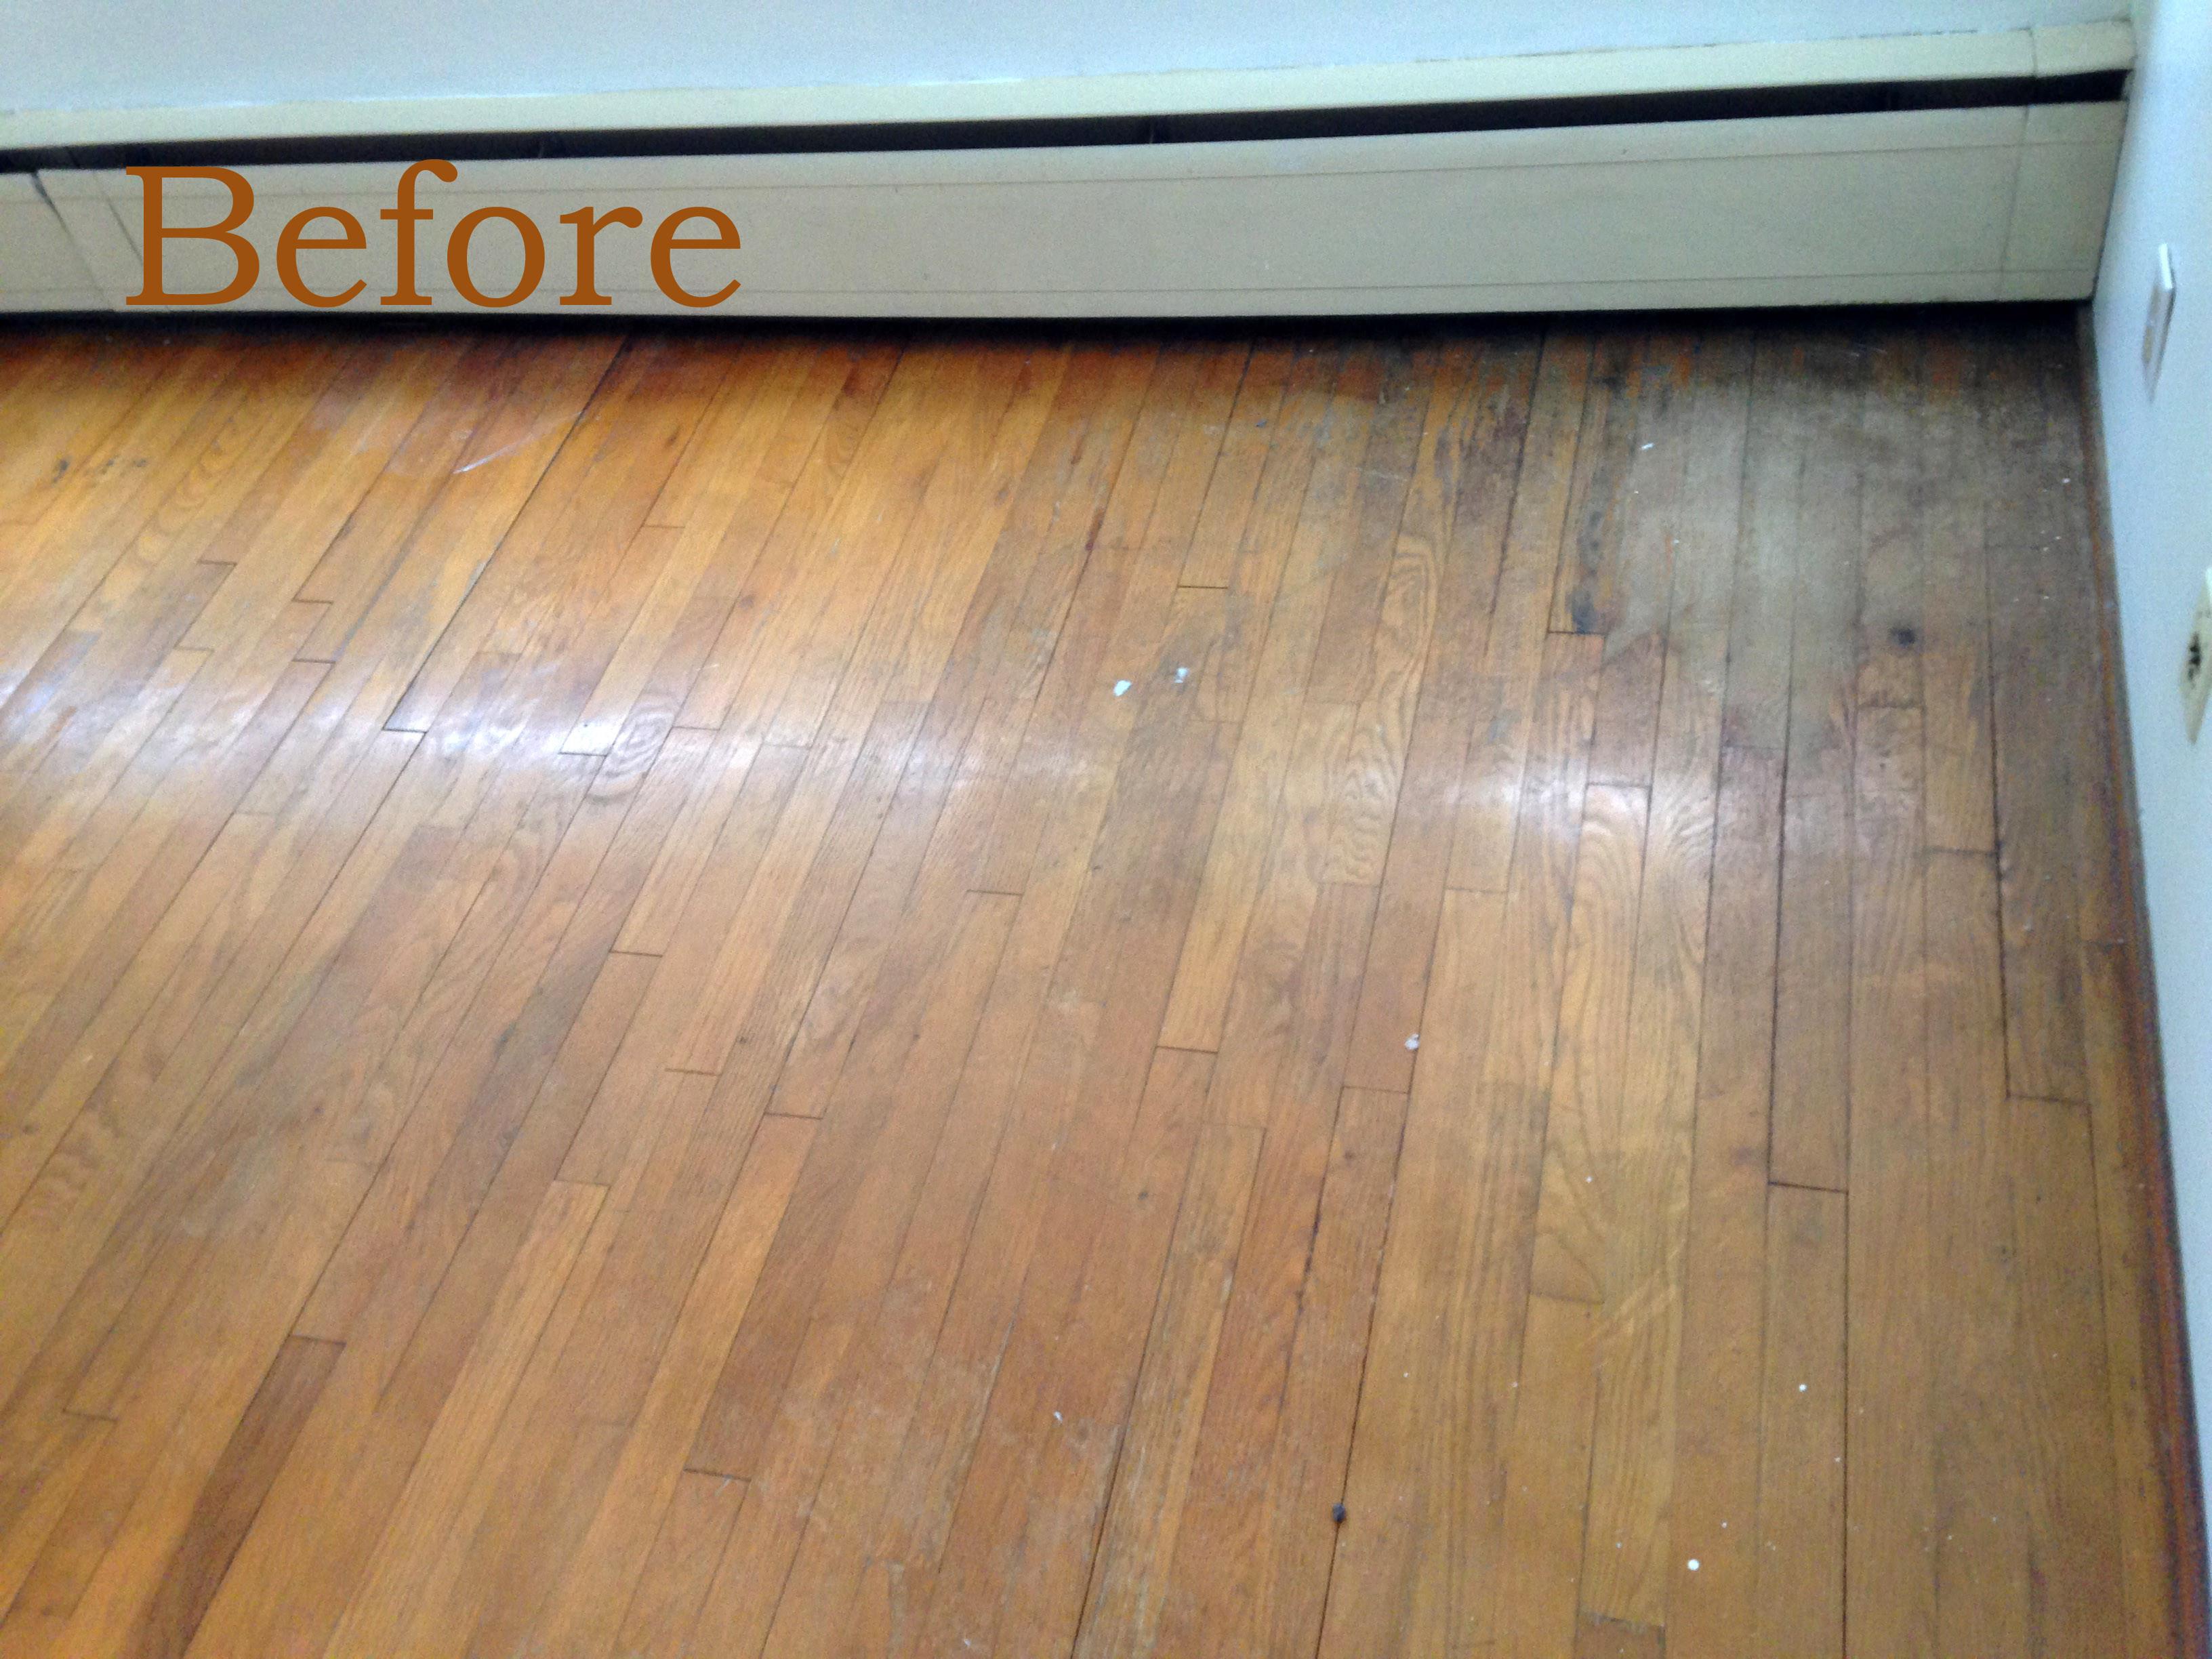 hardwood floor renovation of floor refinishing company hardwood floors service by cris floor with floor refinishing company hardwood floor refinishing installation victoria